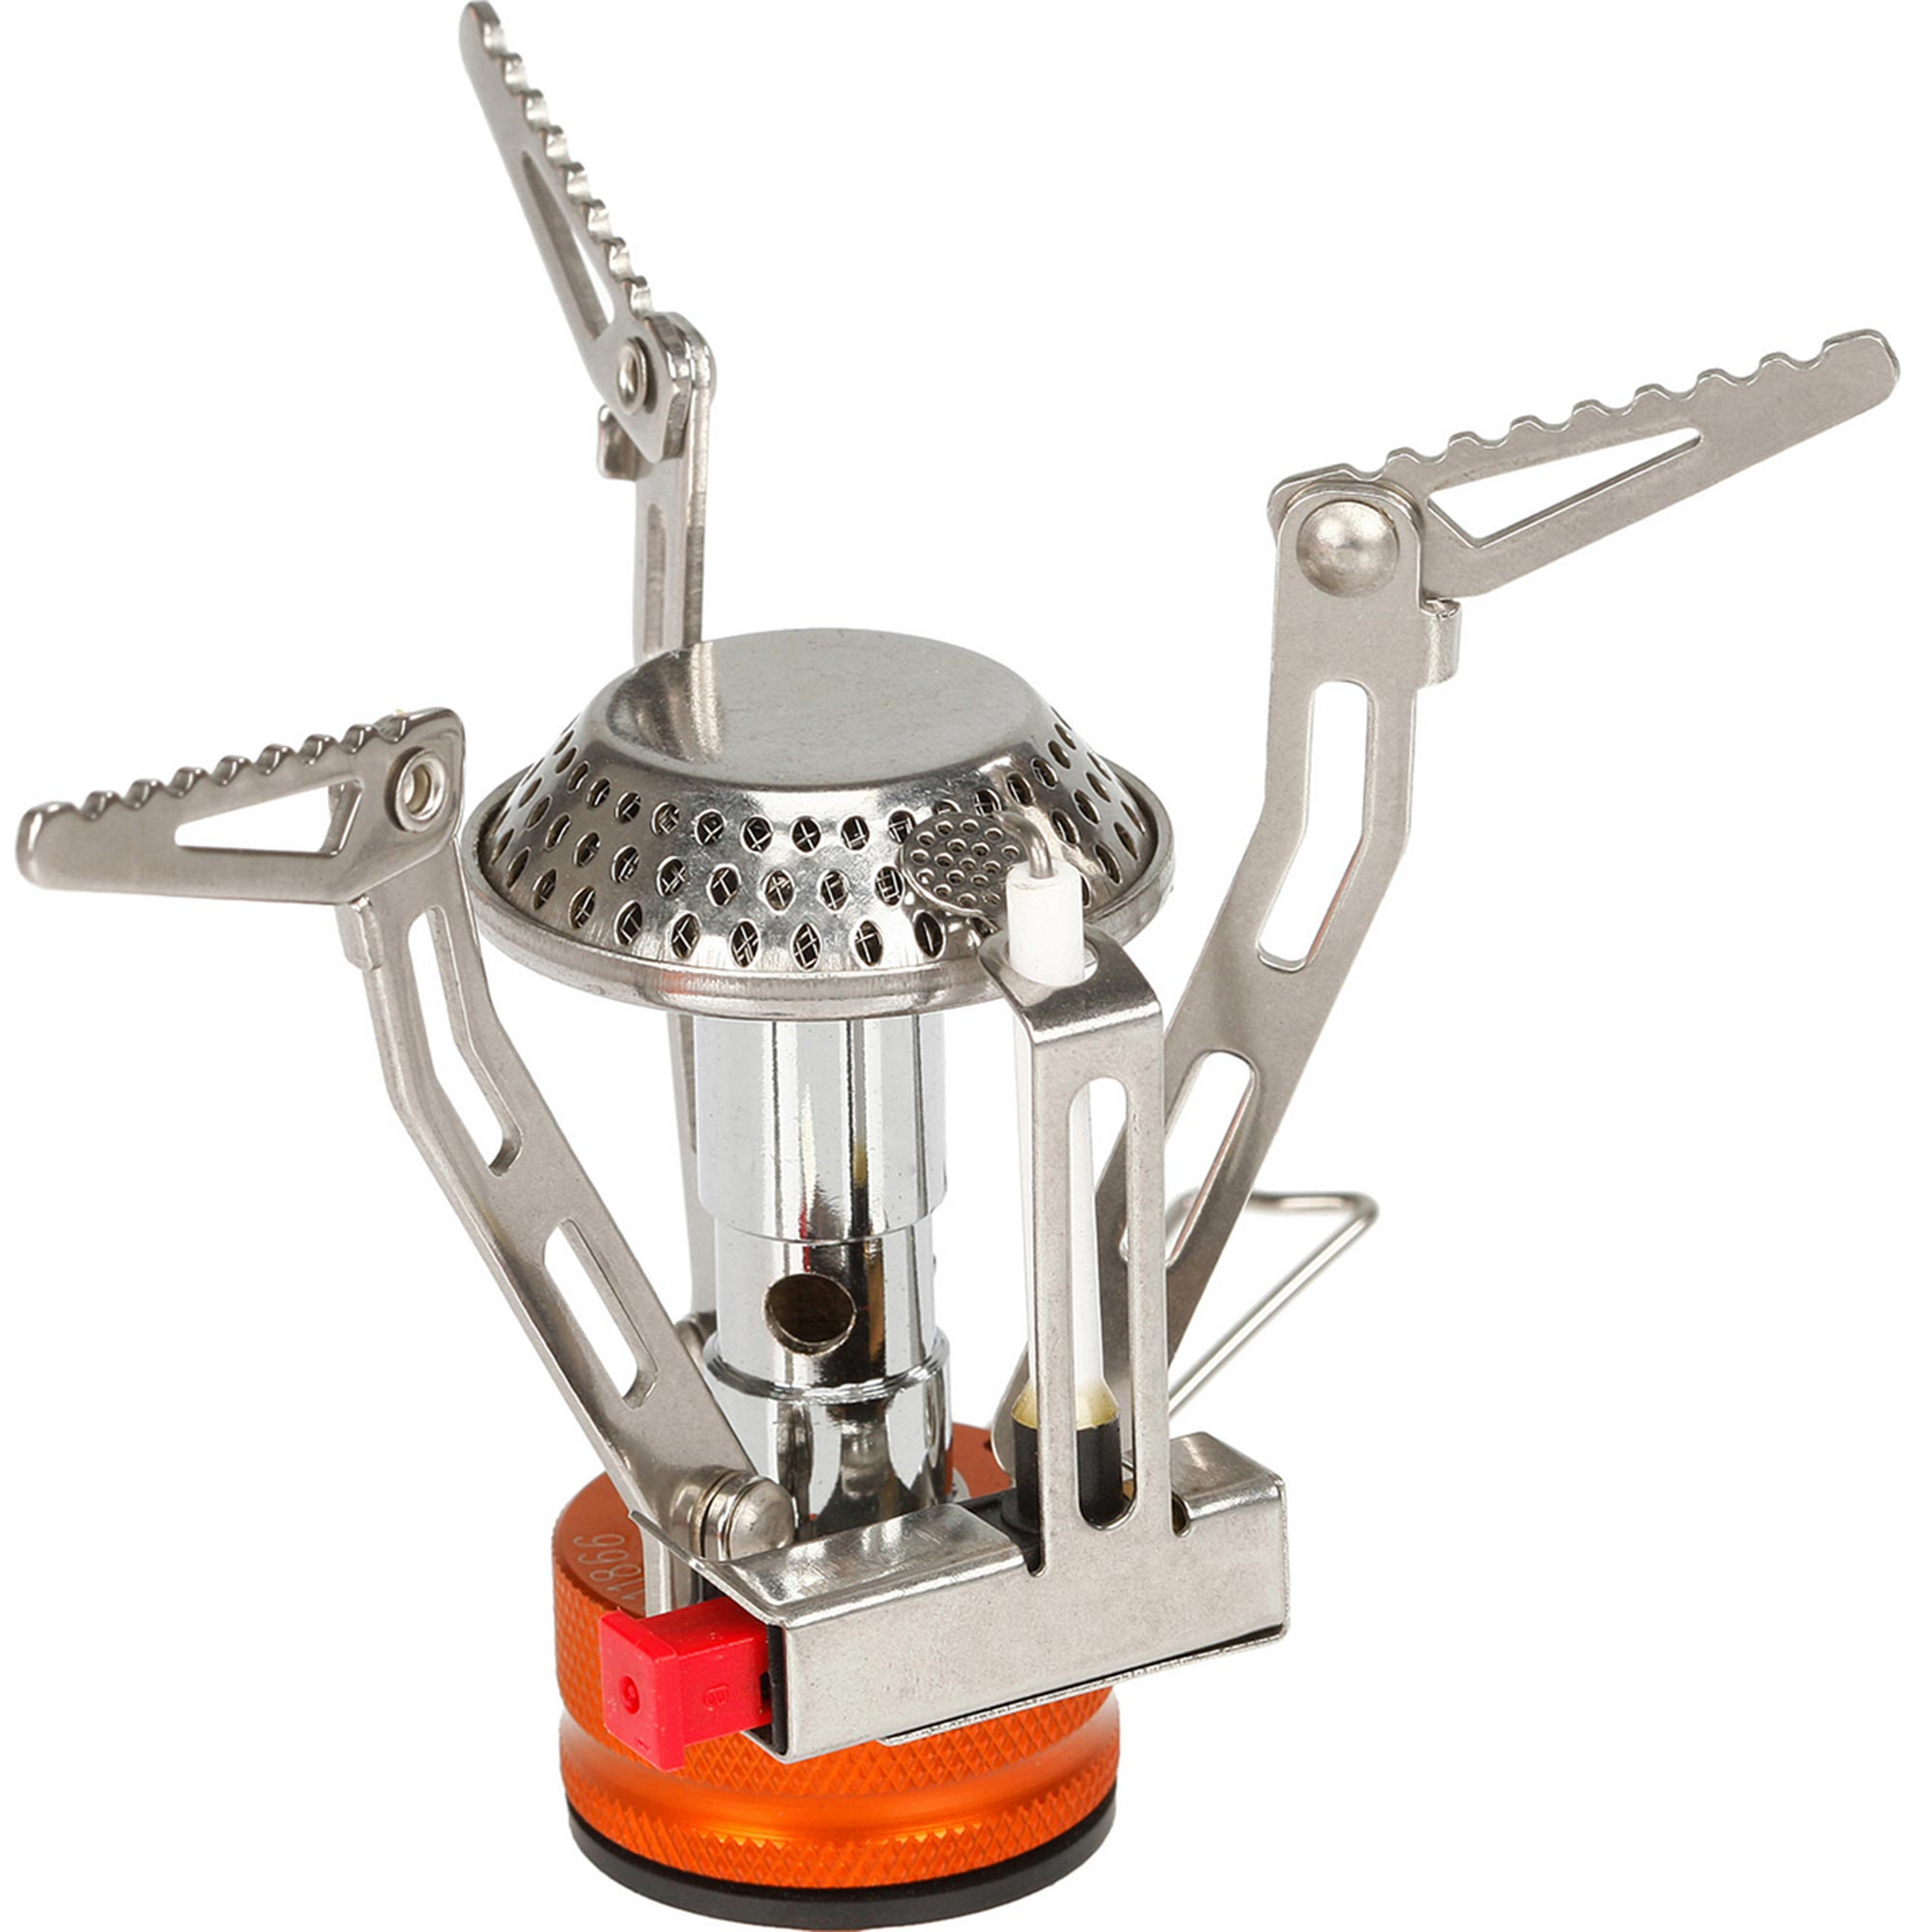 Подробнее о Fire-Maple Газовая горелка Fire-Maple FMS-102 горелка для сварки